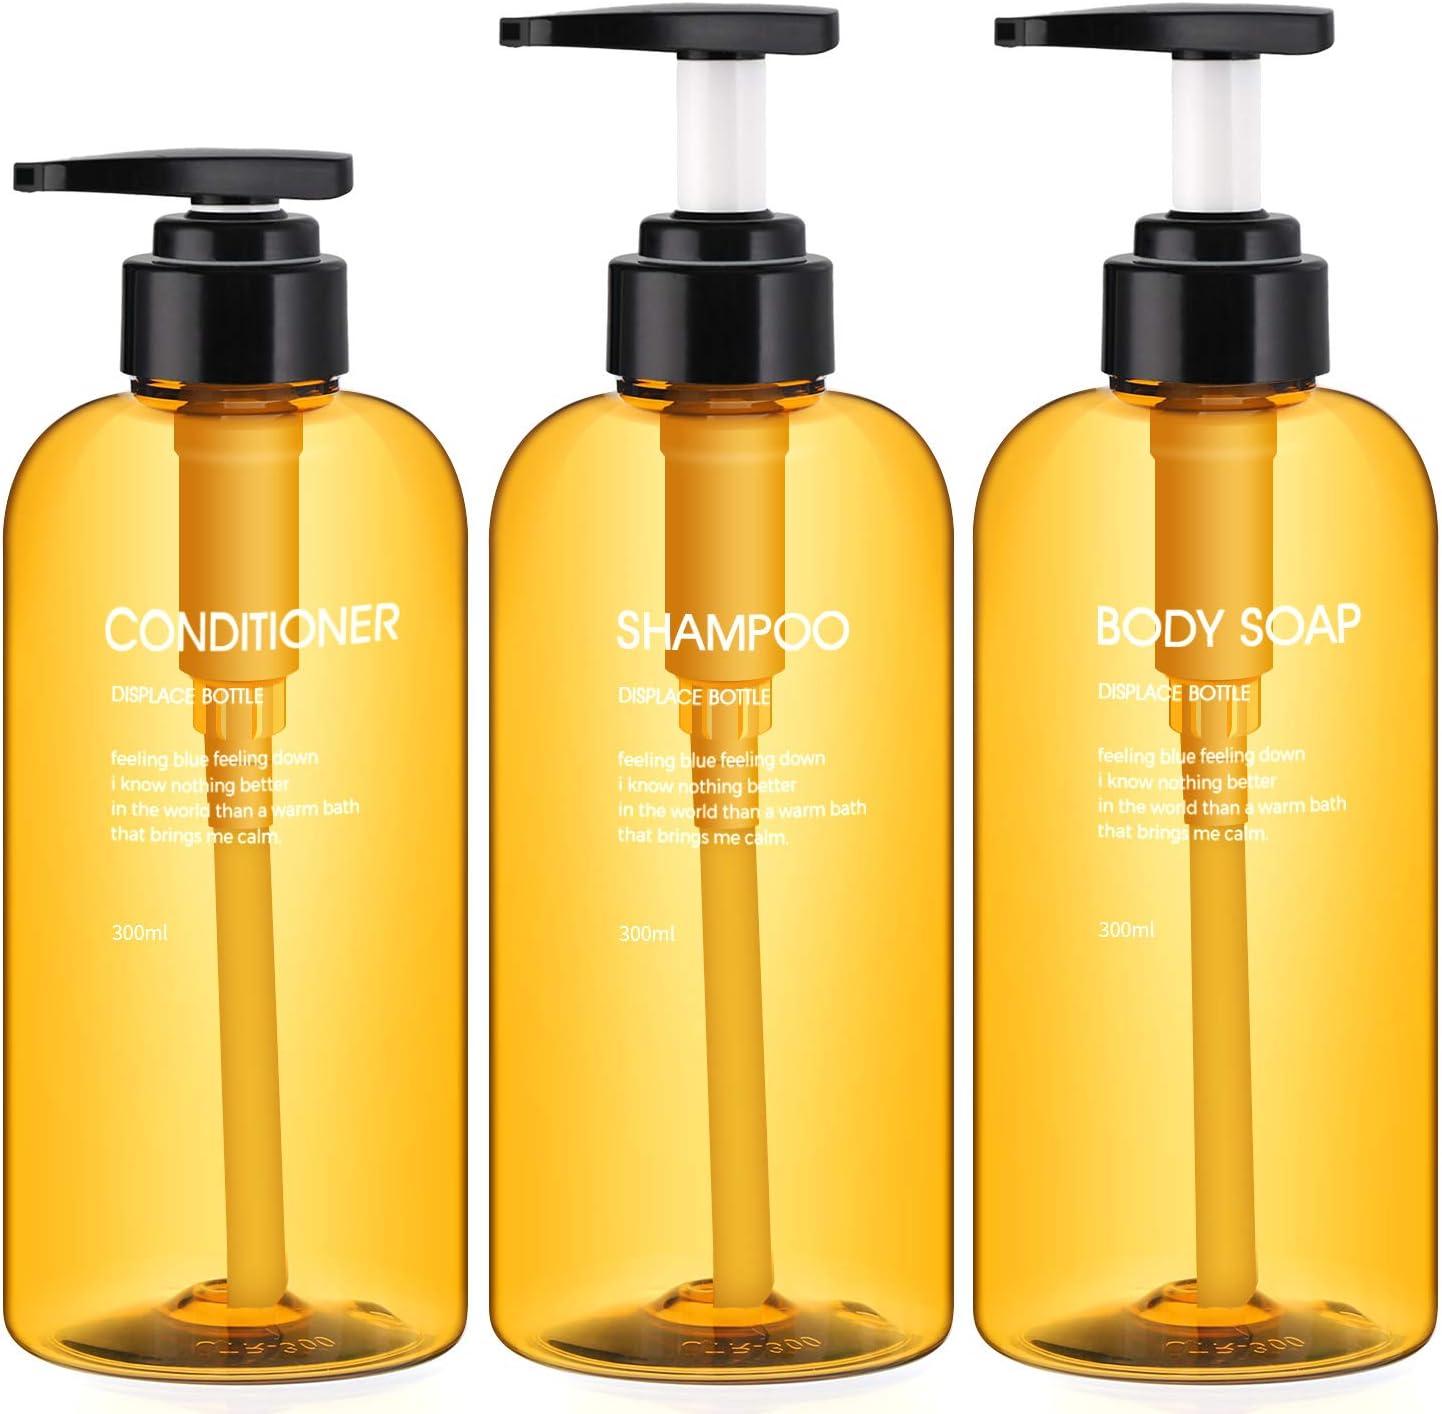 Botellas de dispensador de 3 Piezas para baño, Botellas de Bomba Recargables Segbeauty de 500 ml para jabón líquido Acondicionador de champú Dispensador de loción de Prensa de Gel de Ducha - Marrón